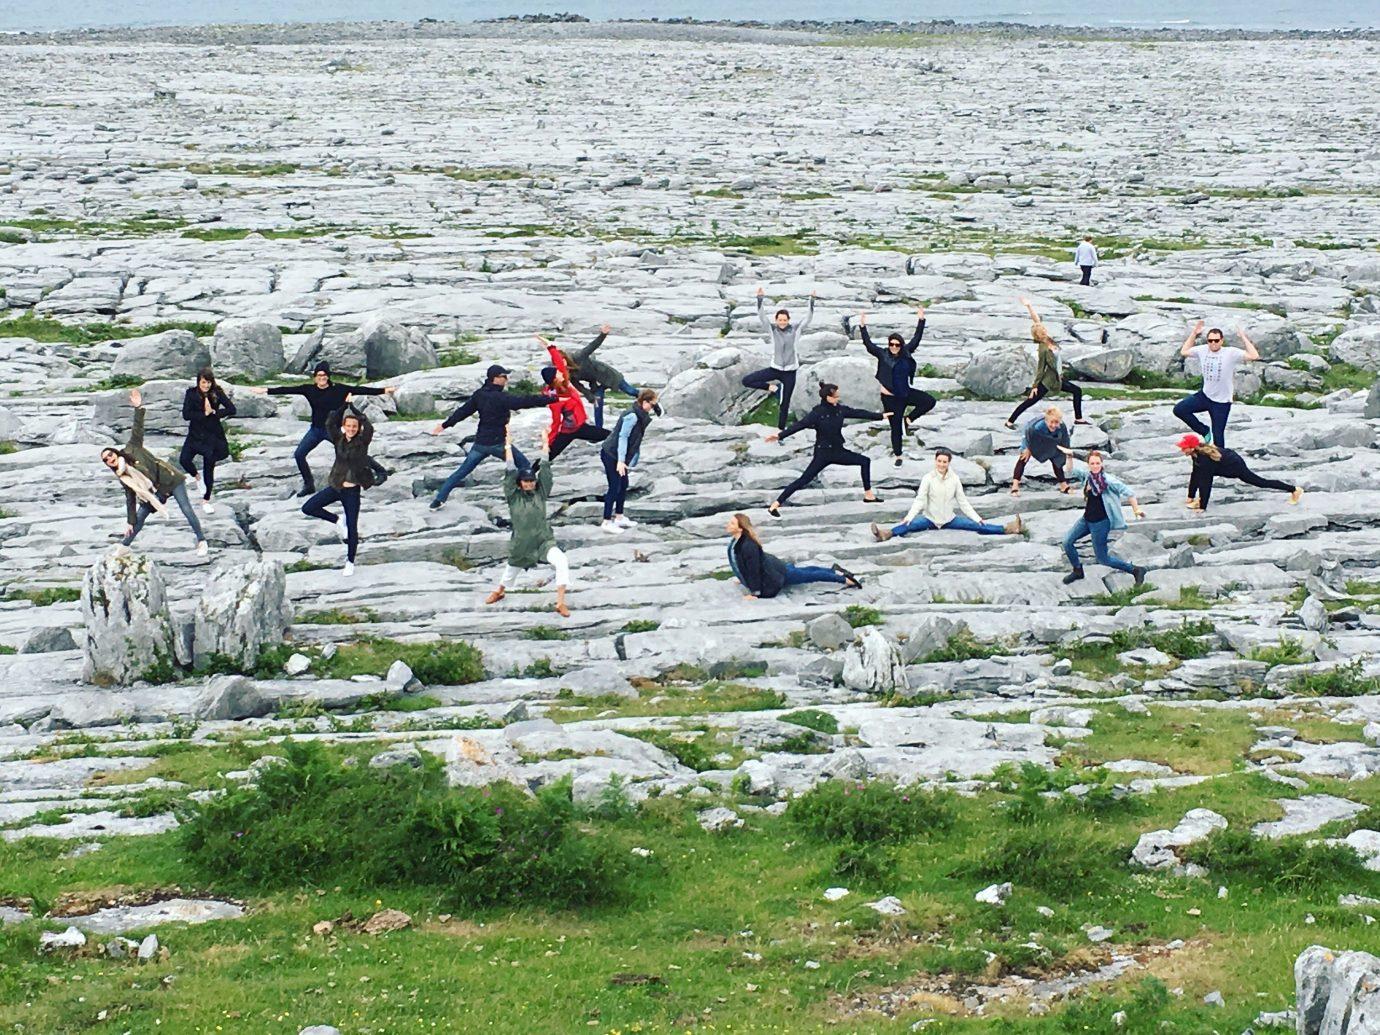 Health + Wellness Meditation Retreats Trip Ideas Yoga Retreats grass outdoor sky group people shore Coast Sea walking wetland